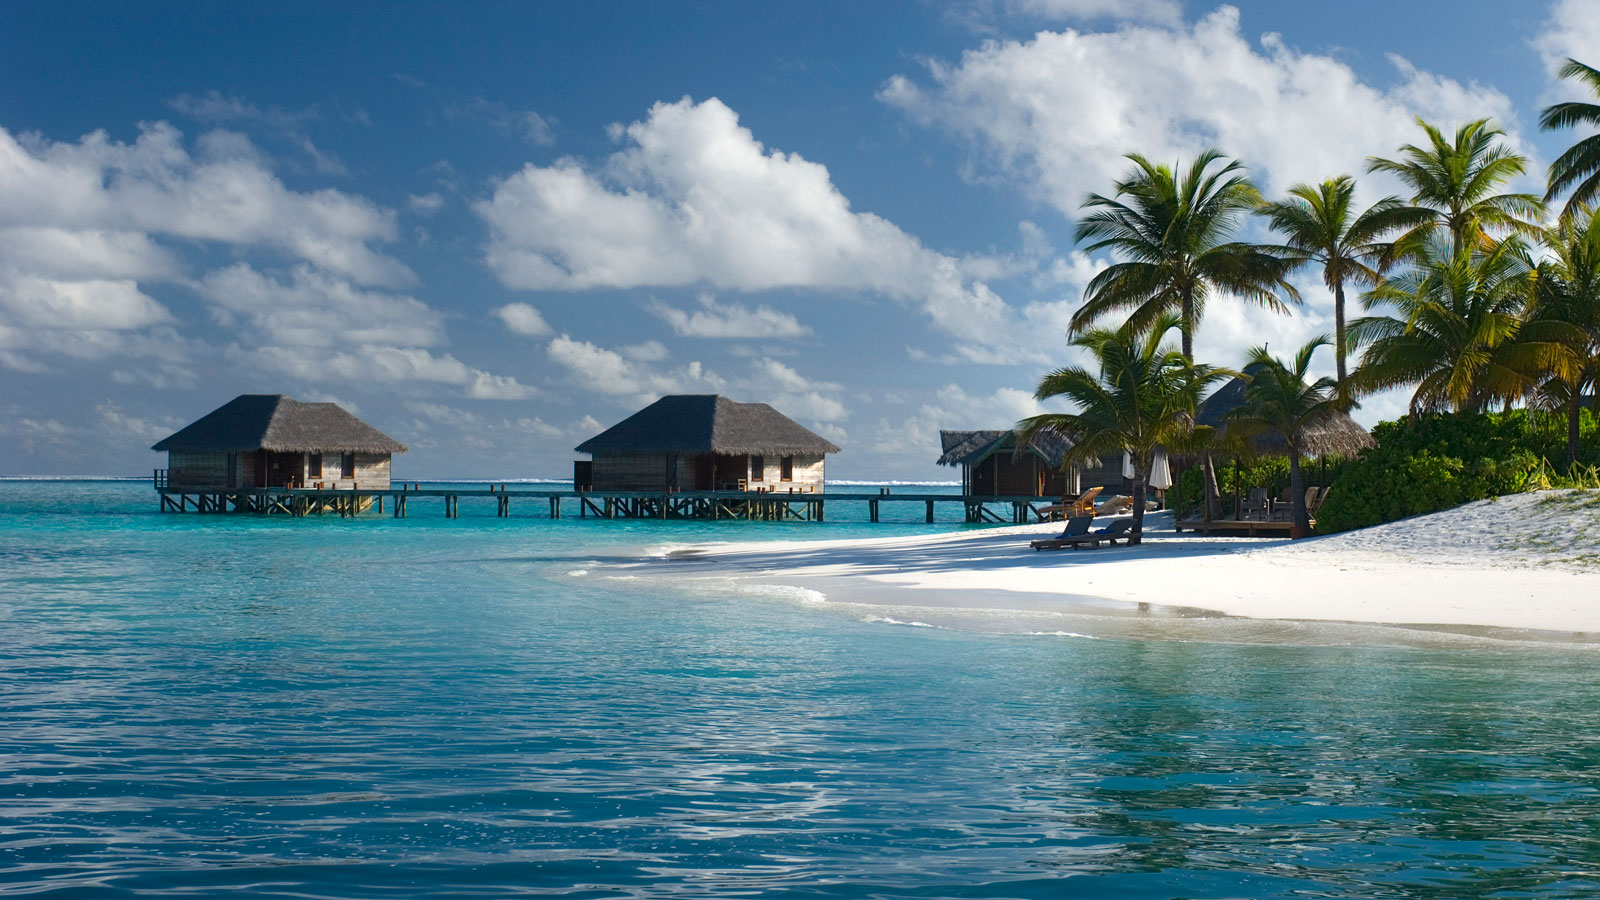 Hotel review conrad maldives rangali island for Hotel conrad maldives rangali island resort